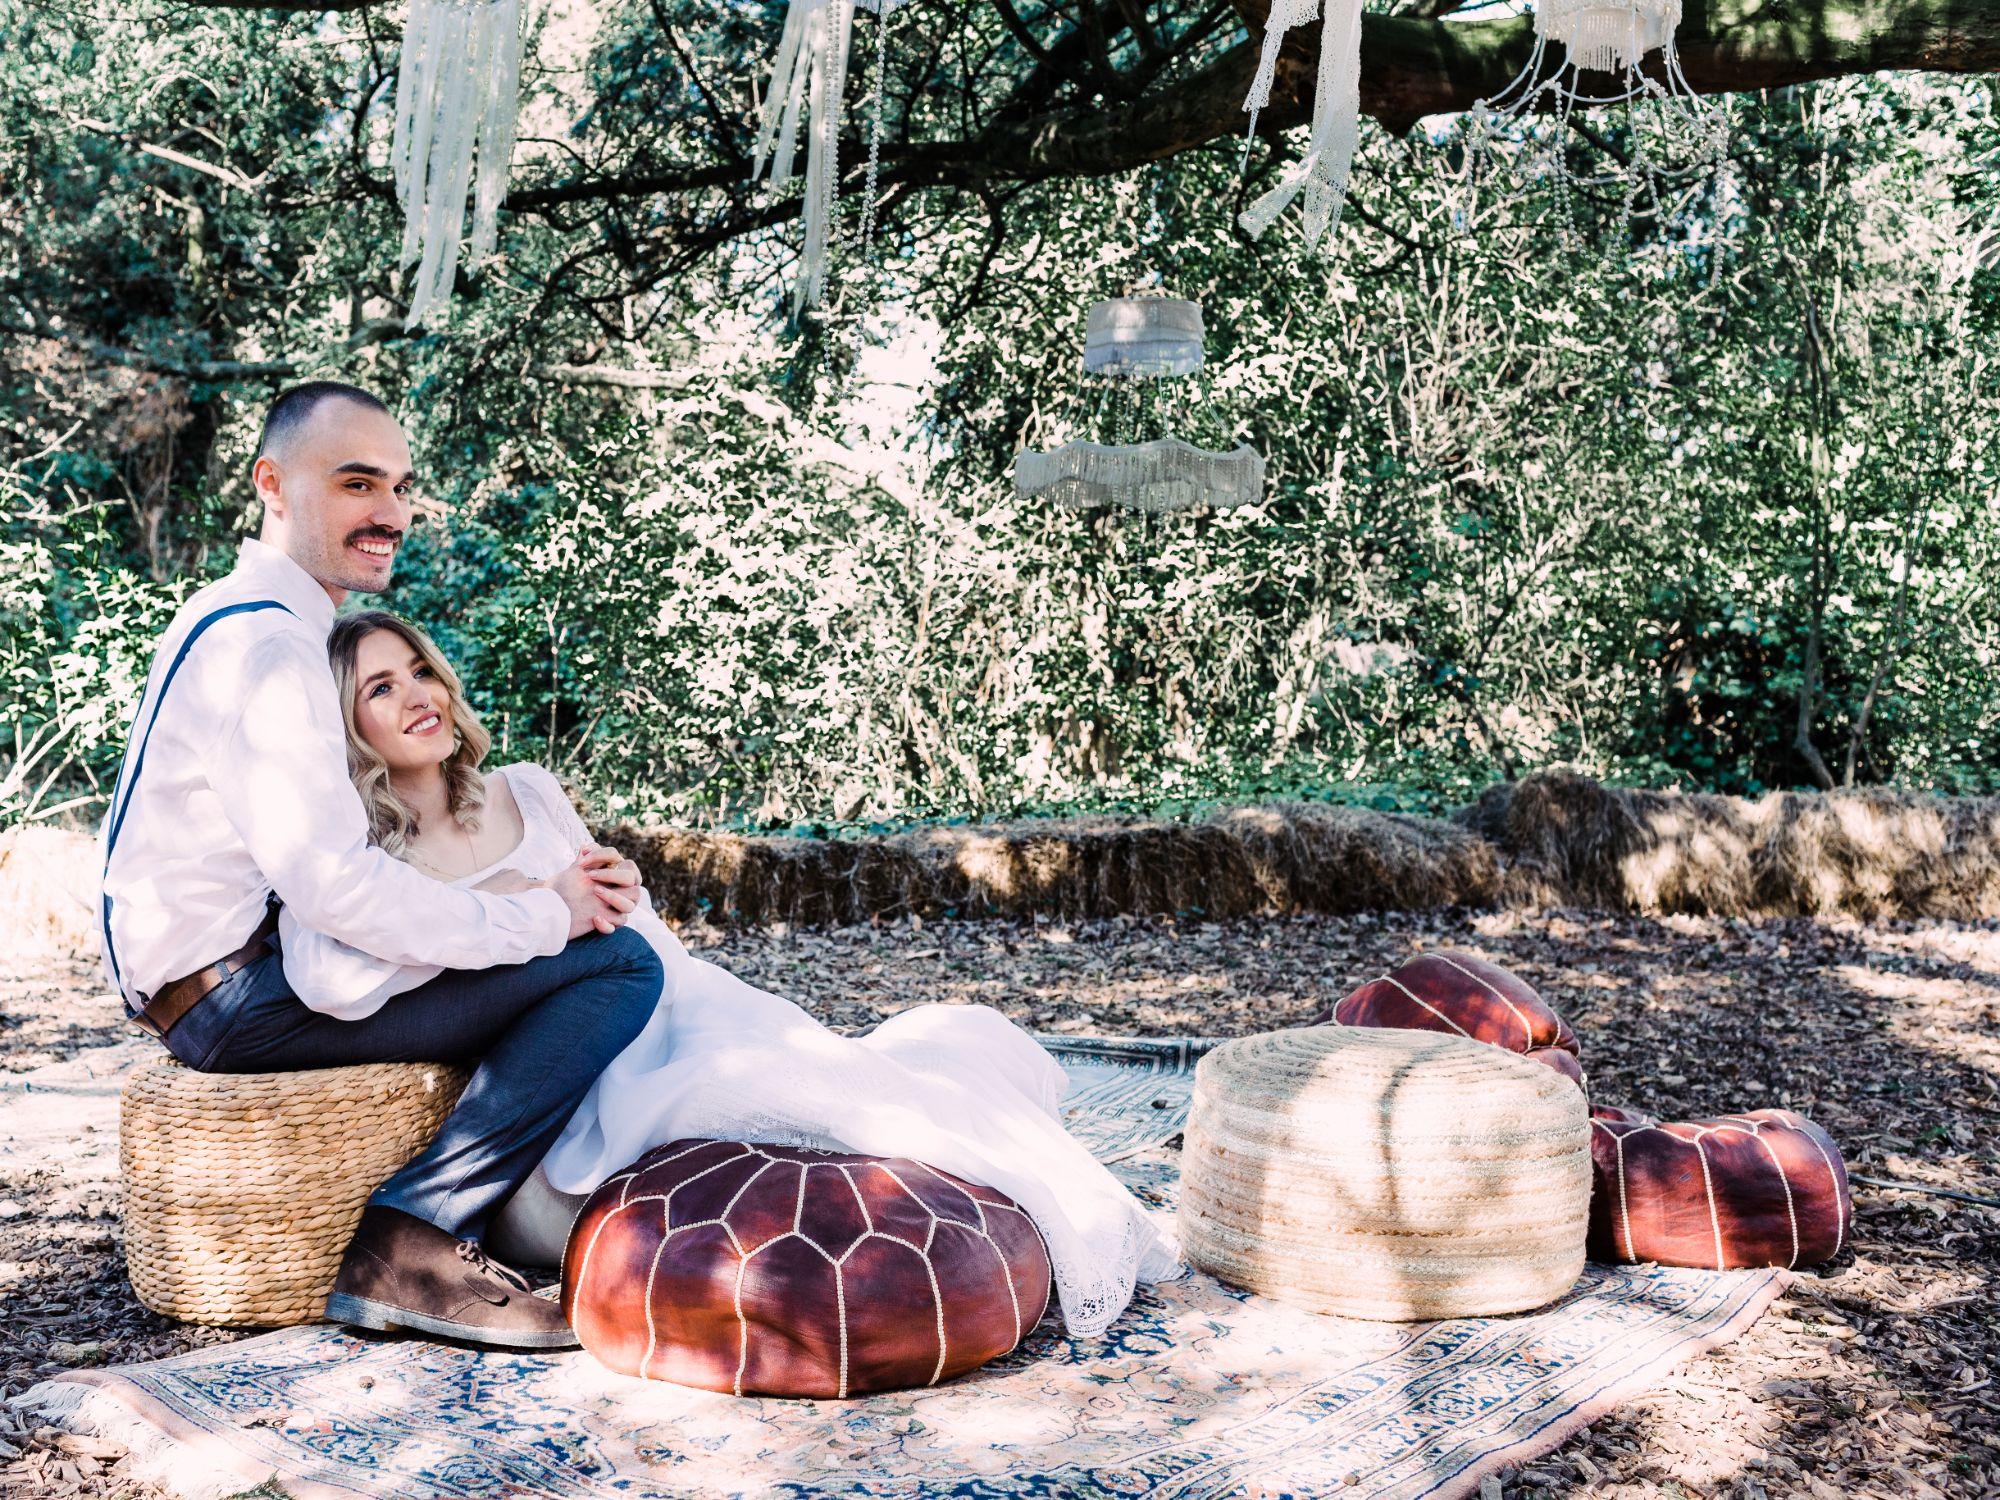 Wedding_Photography_Becky_Tranter_-14